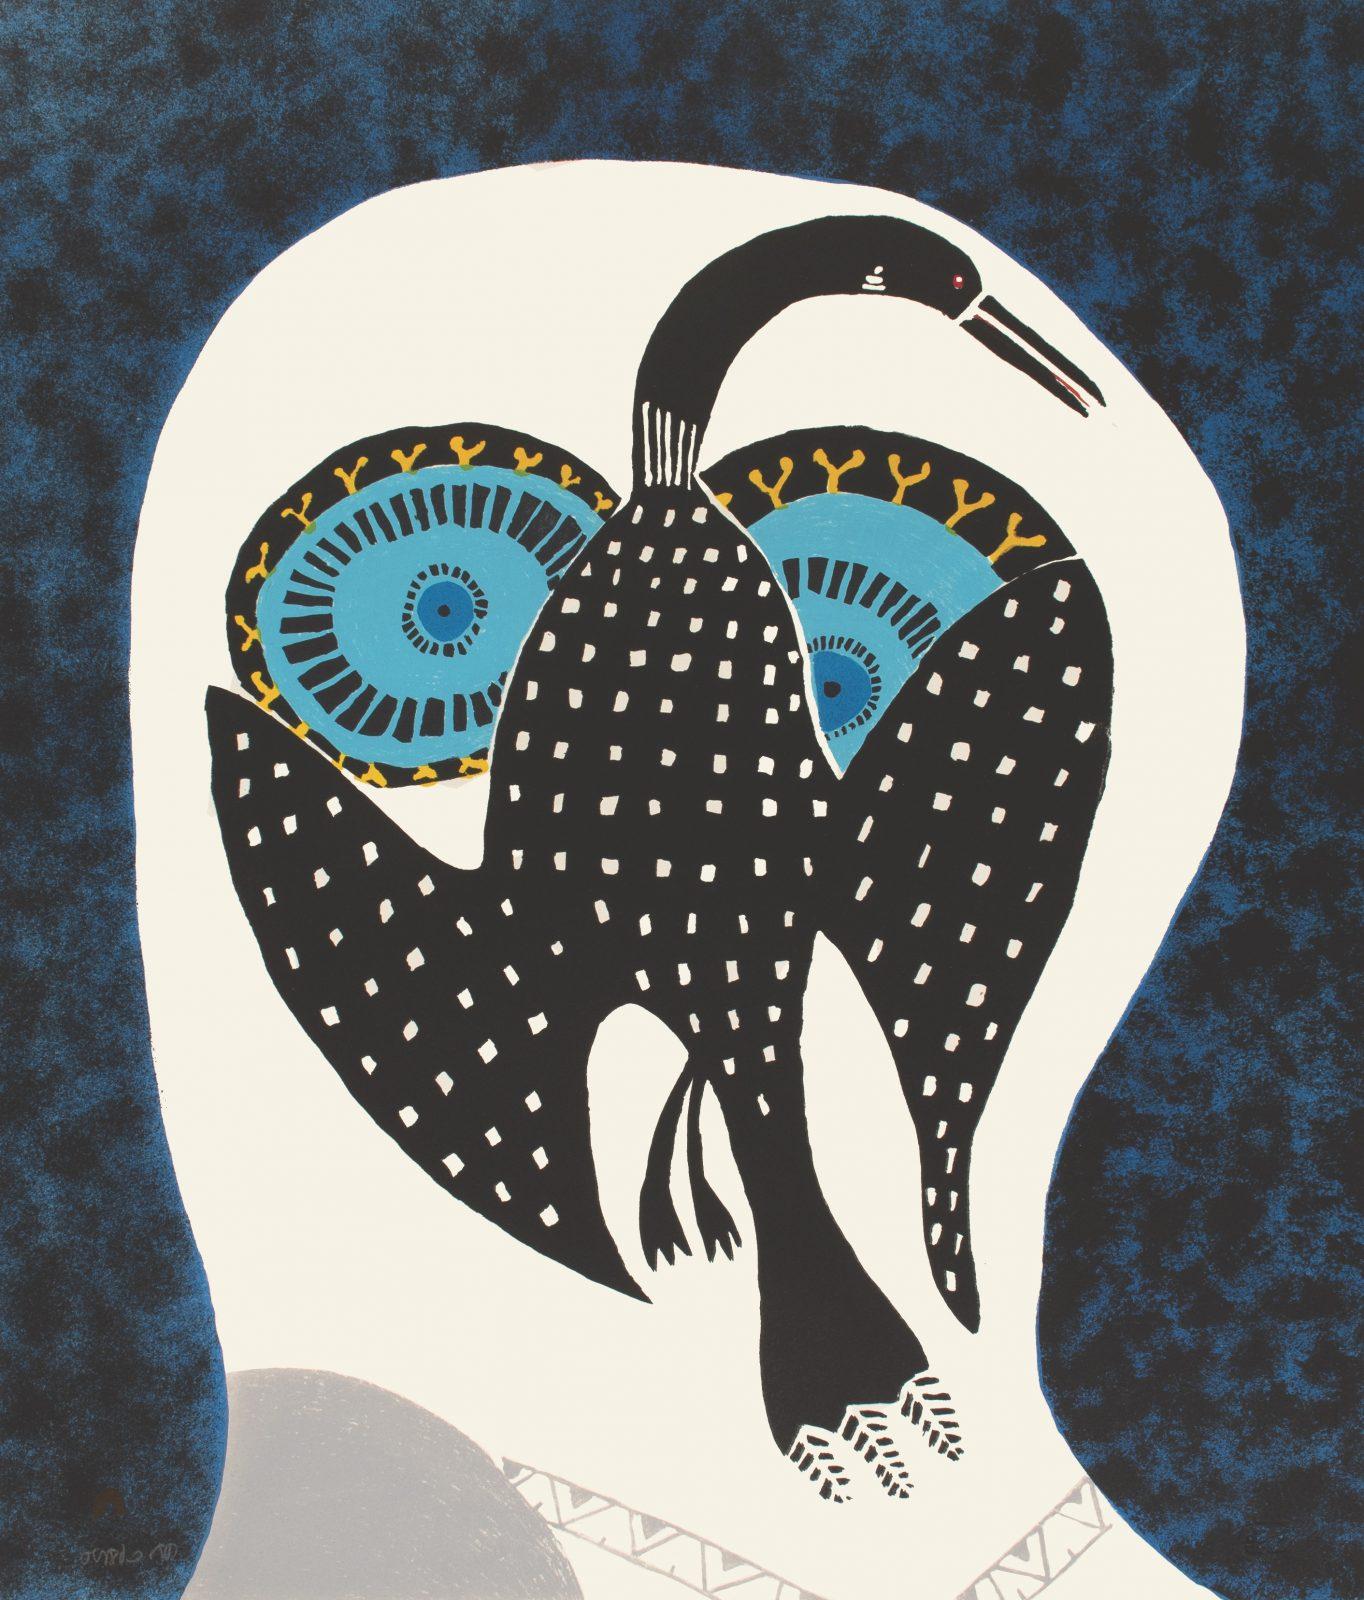 NINGIUKULU TEEVEE Owl Dreams of Loon Cape Dorset Print 2021